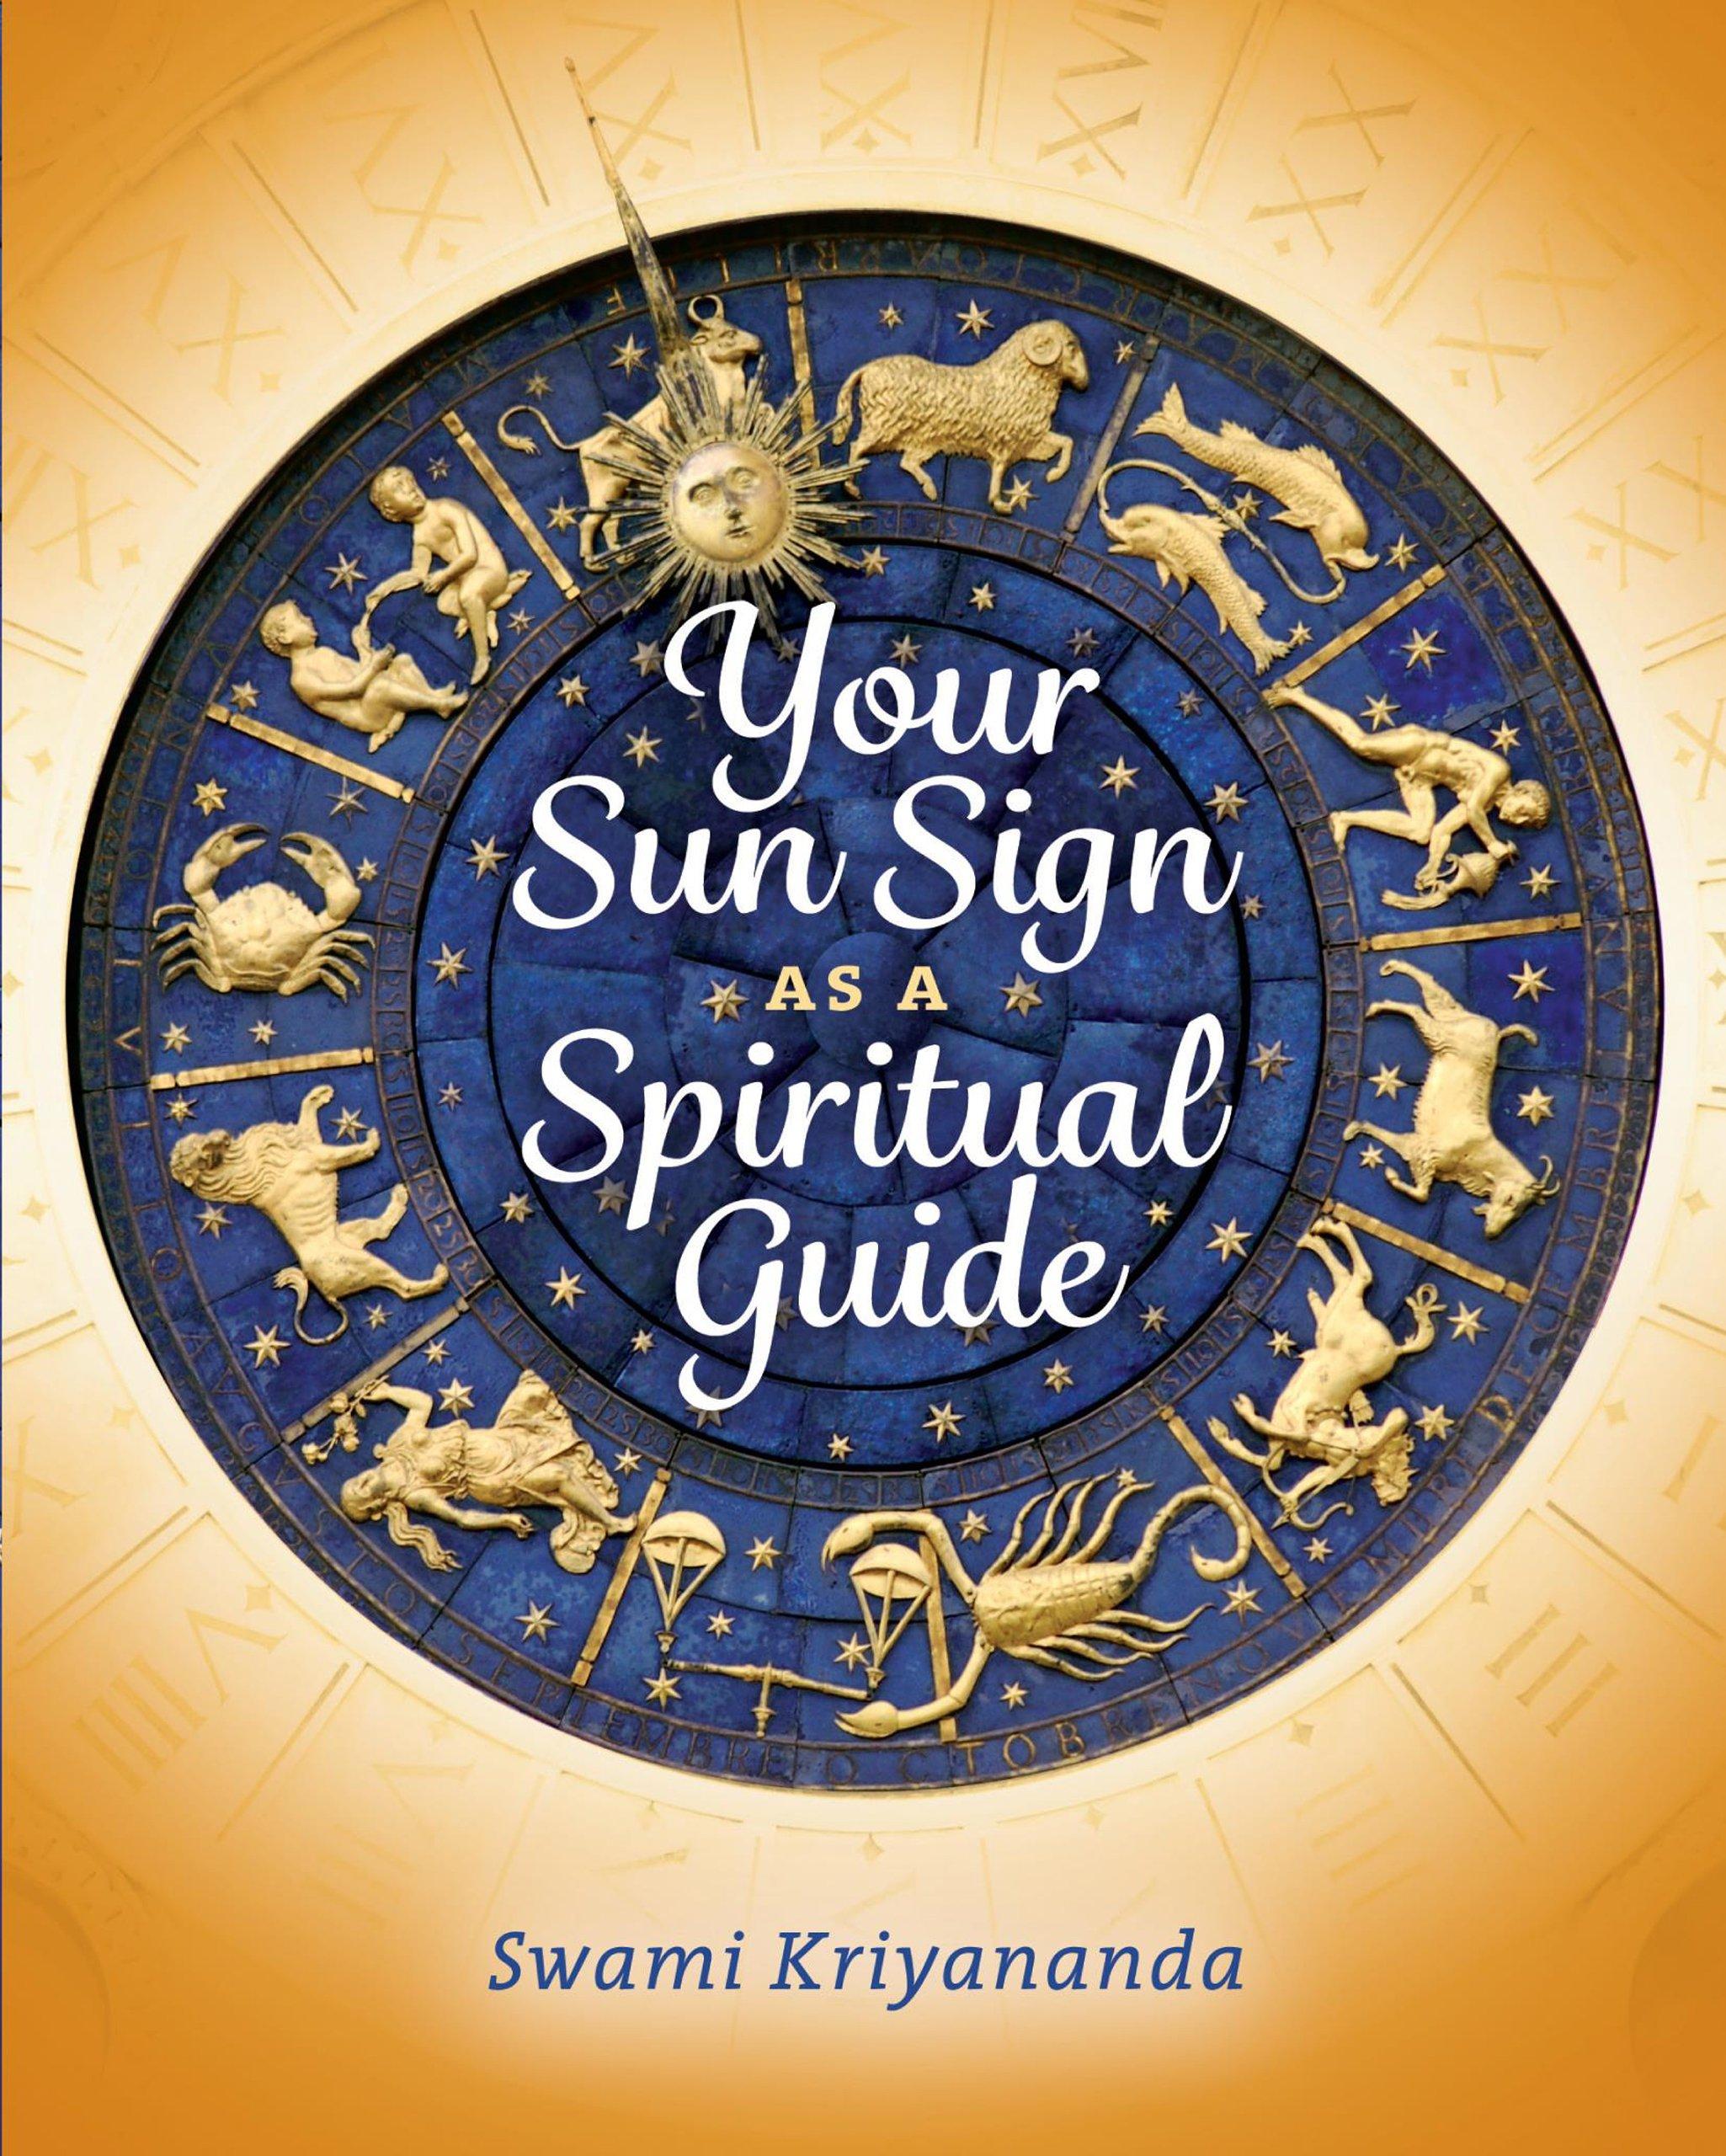 Yogananda on astrology signs